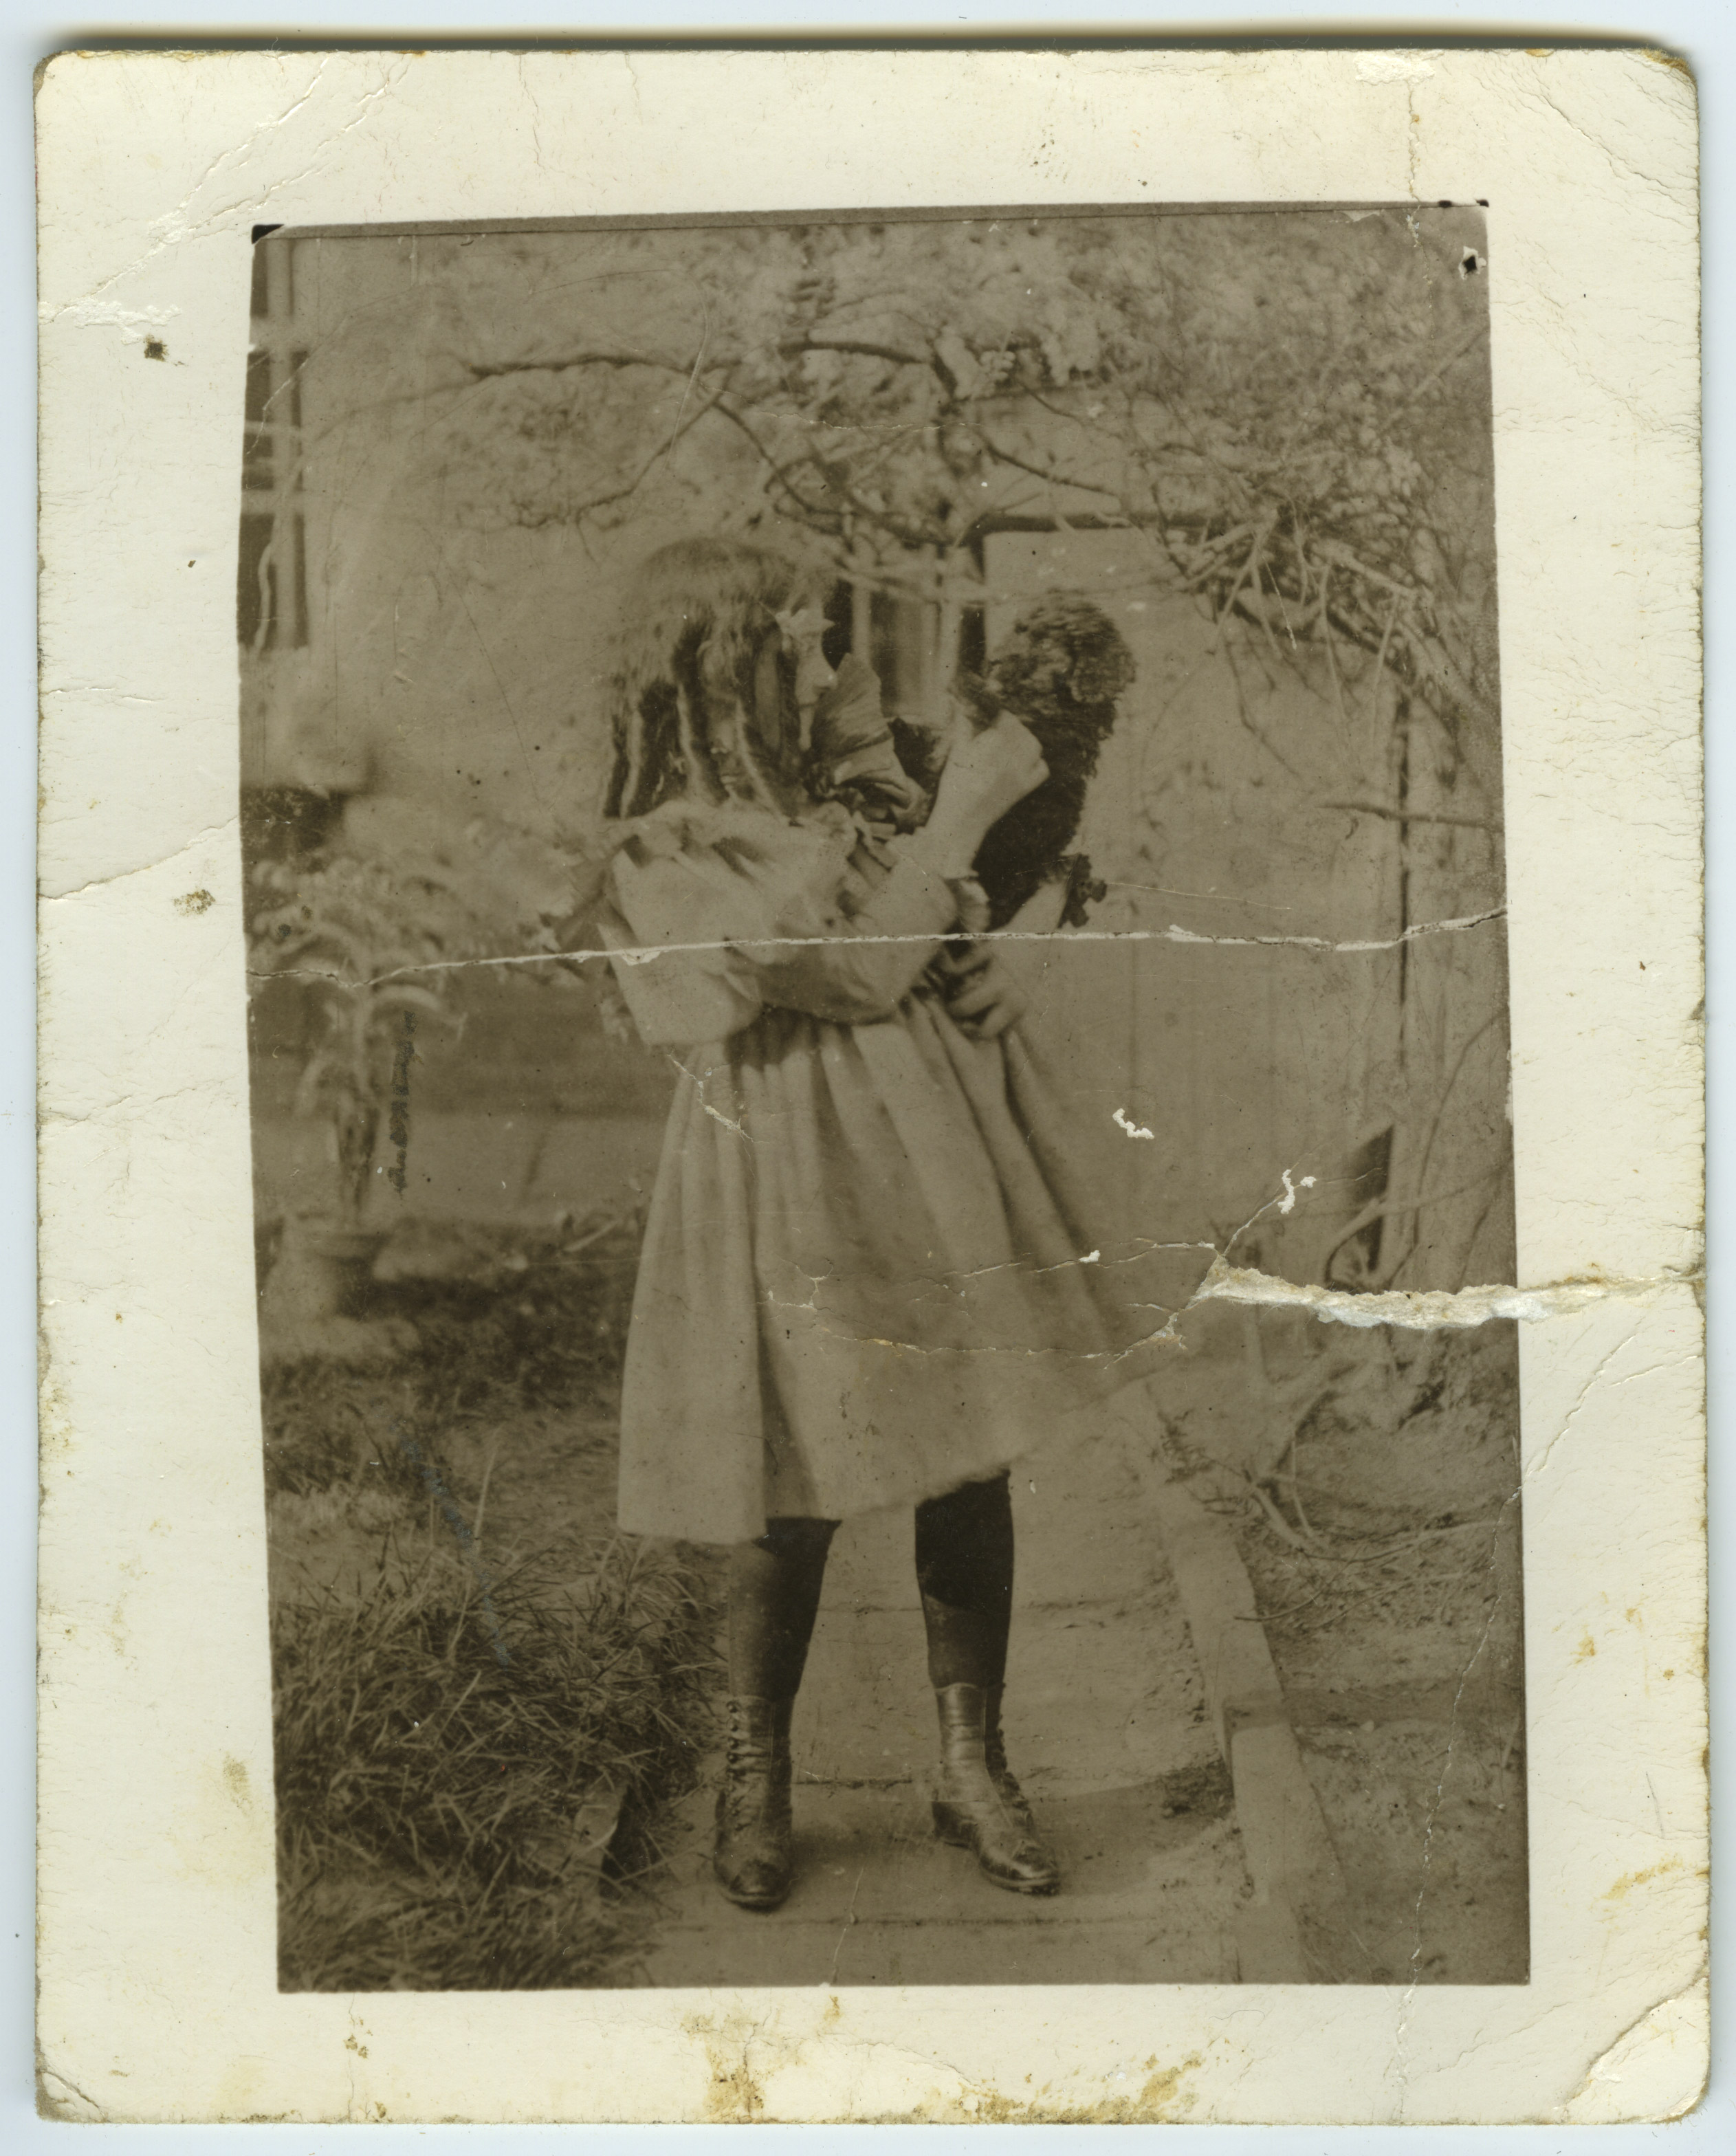 early photographs of mana